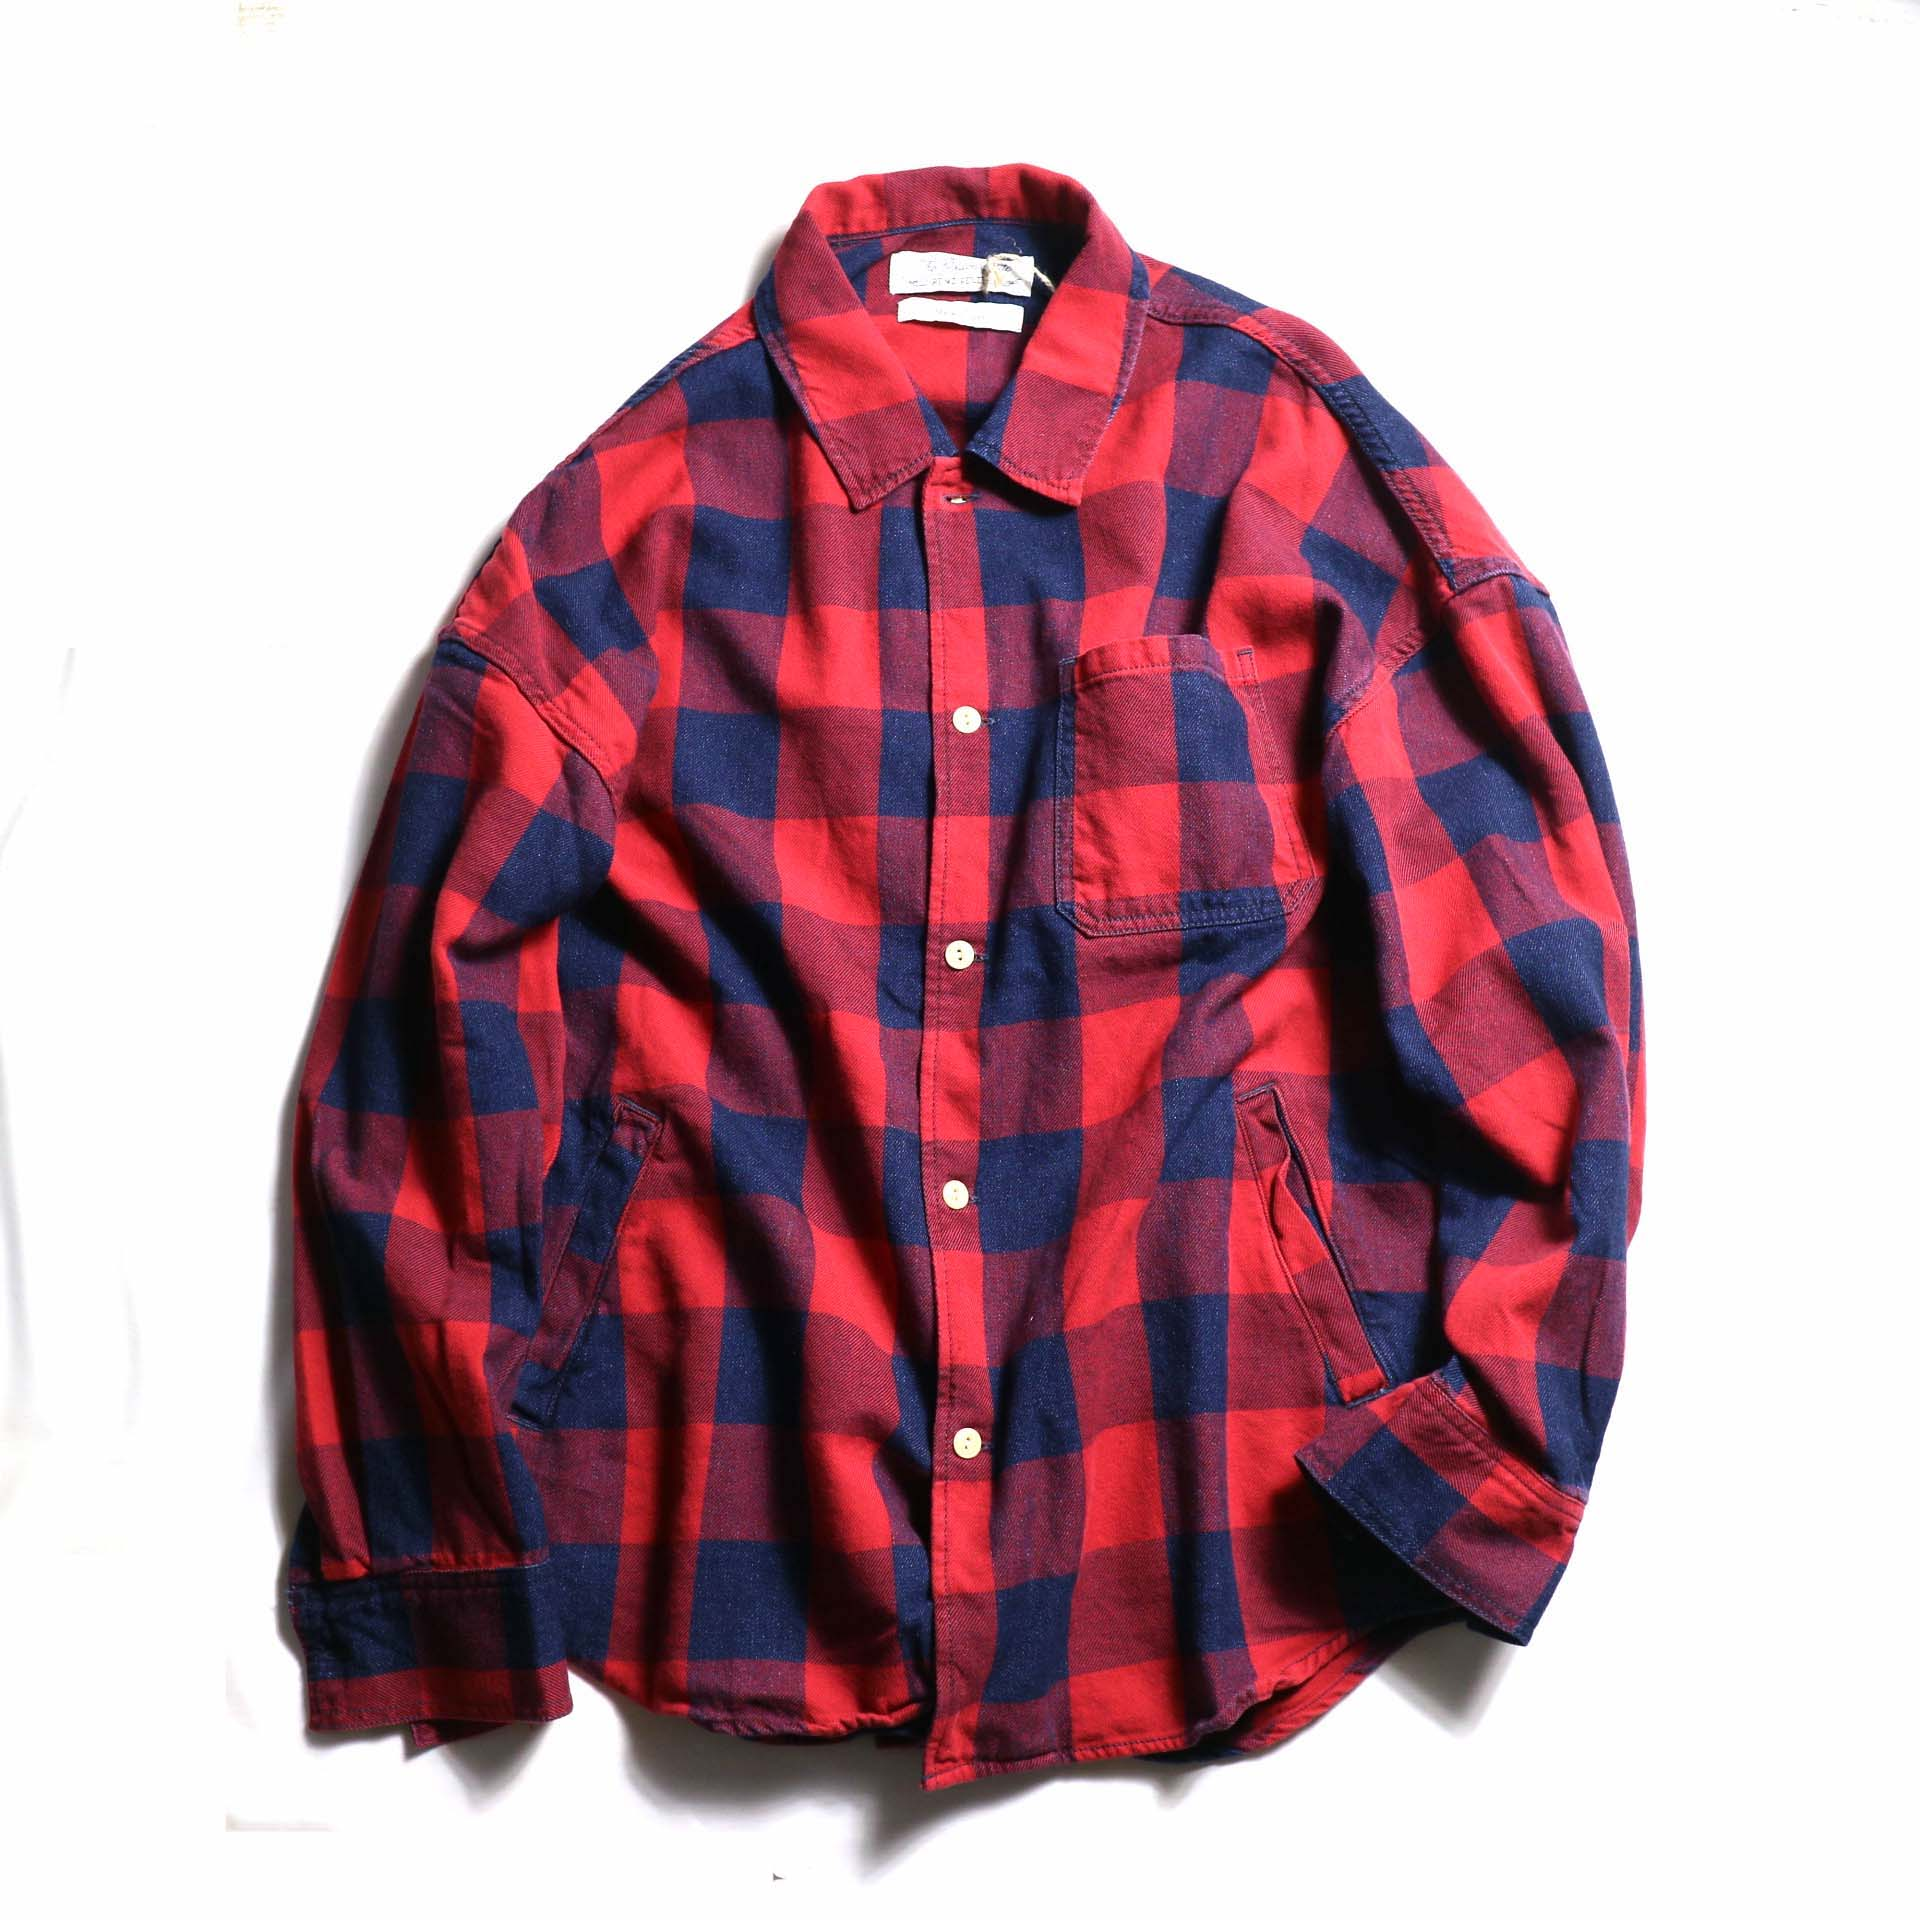 REMI RELIEF / インディゴブロックチェックシャツ -red